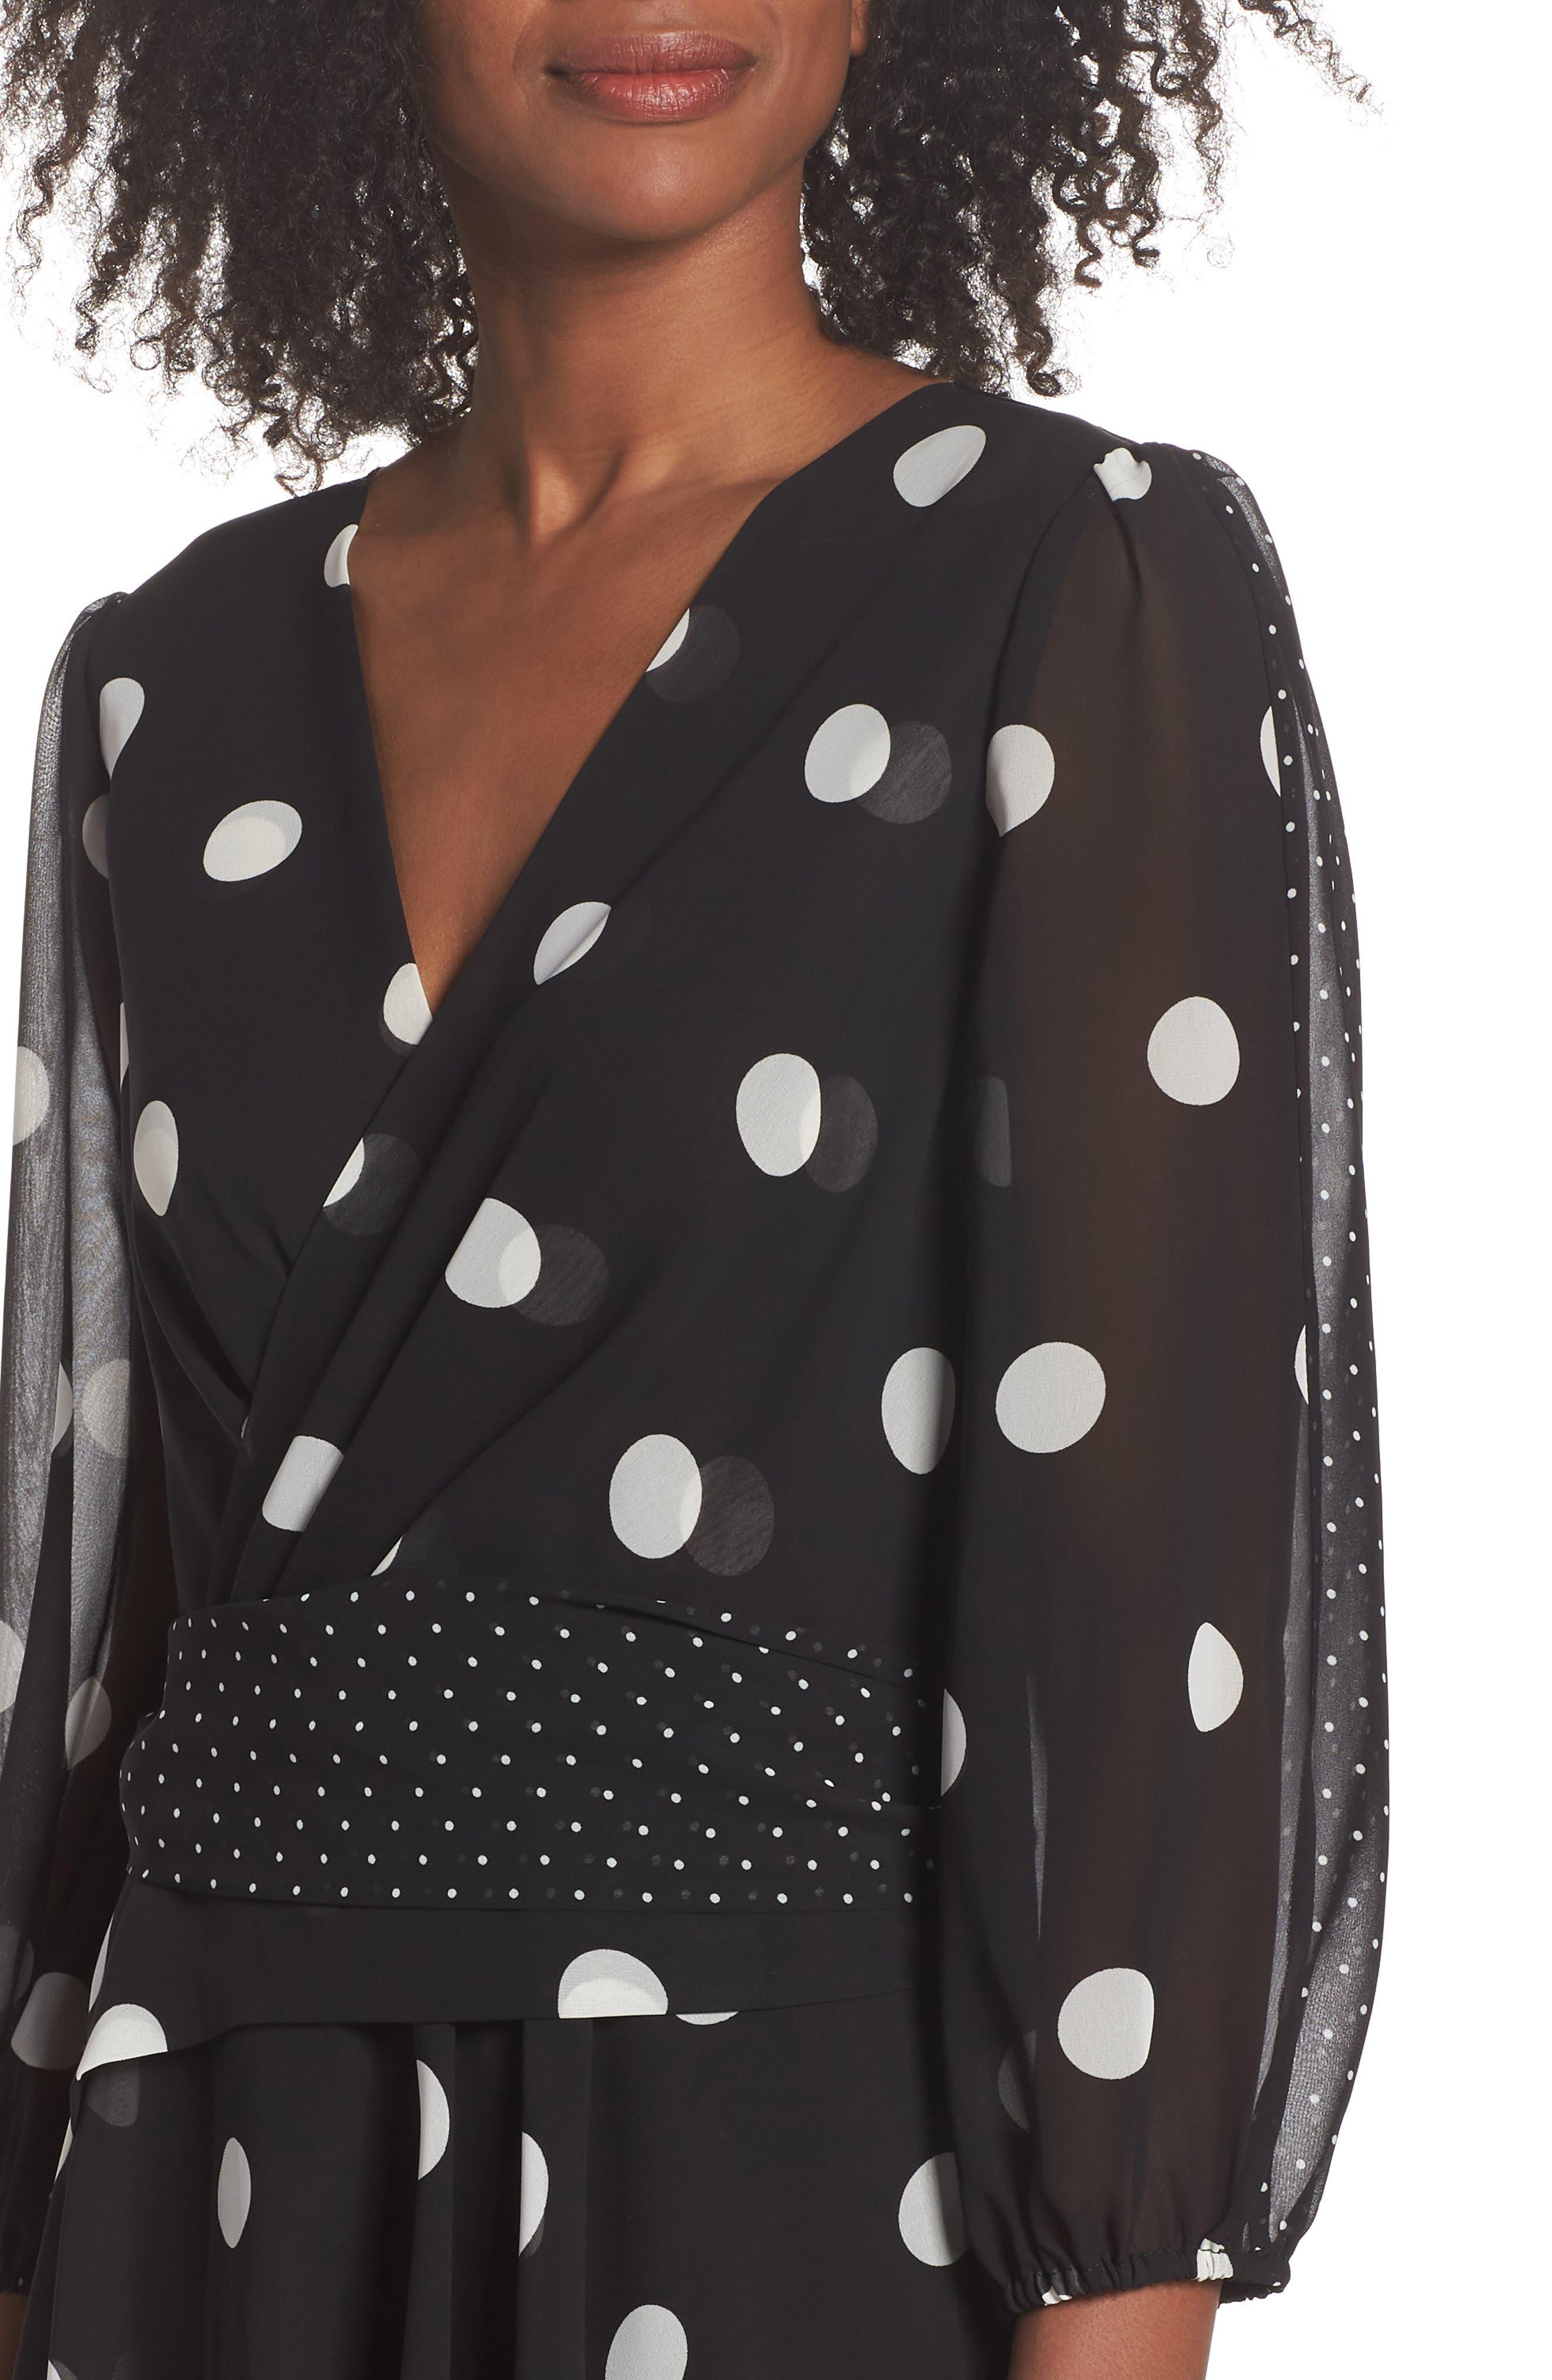 Polka Dot Chiffon Maxi Dress,                             Alternate thumbnail 4, color,                             012